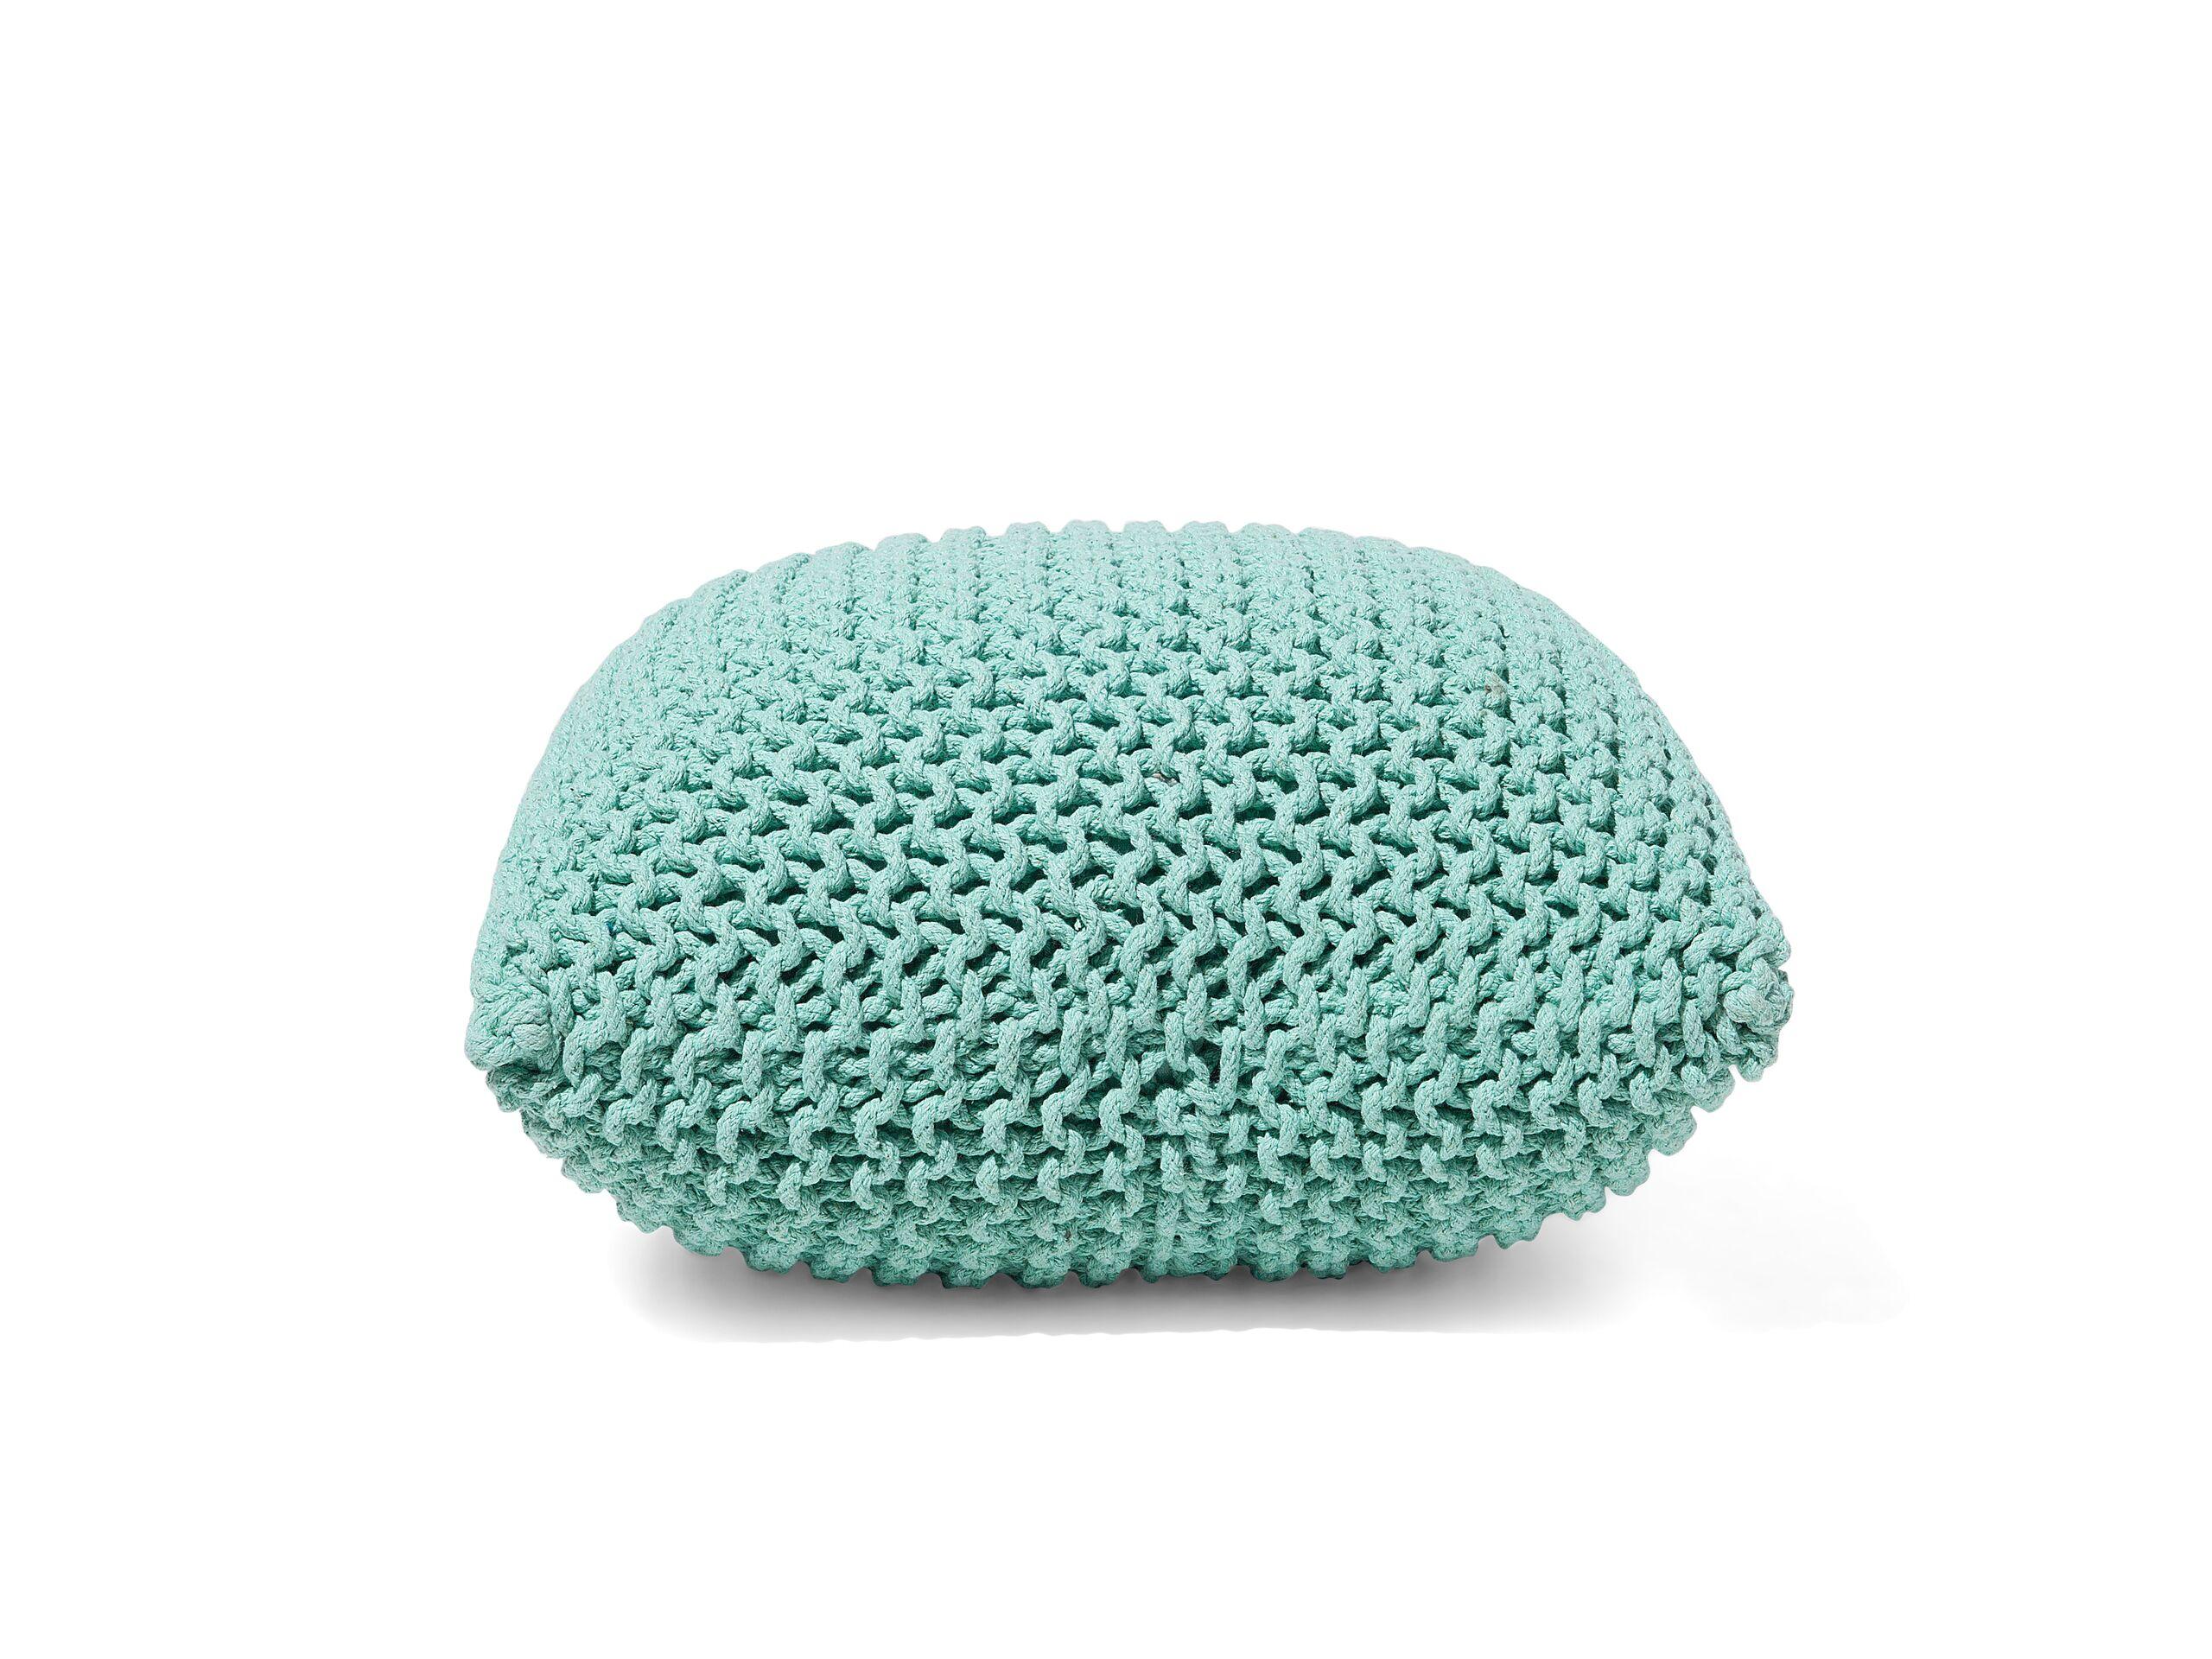 Pouf en coton vert émeraude 50 cm